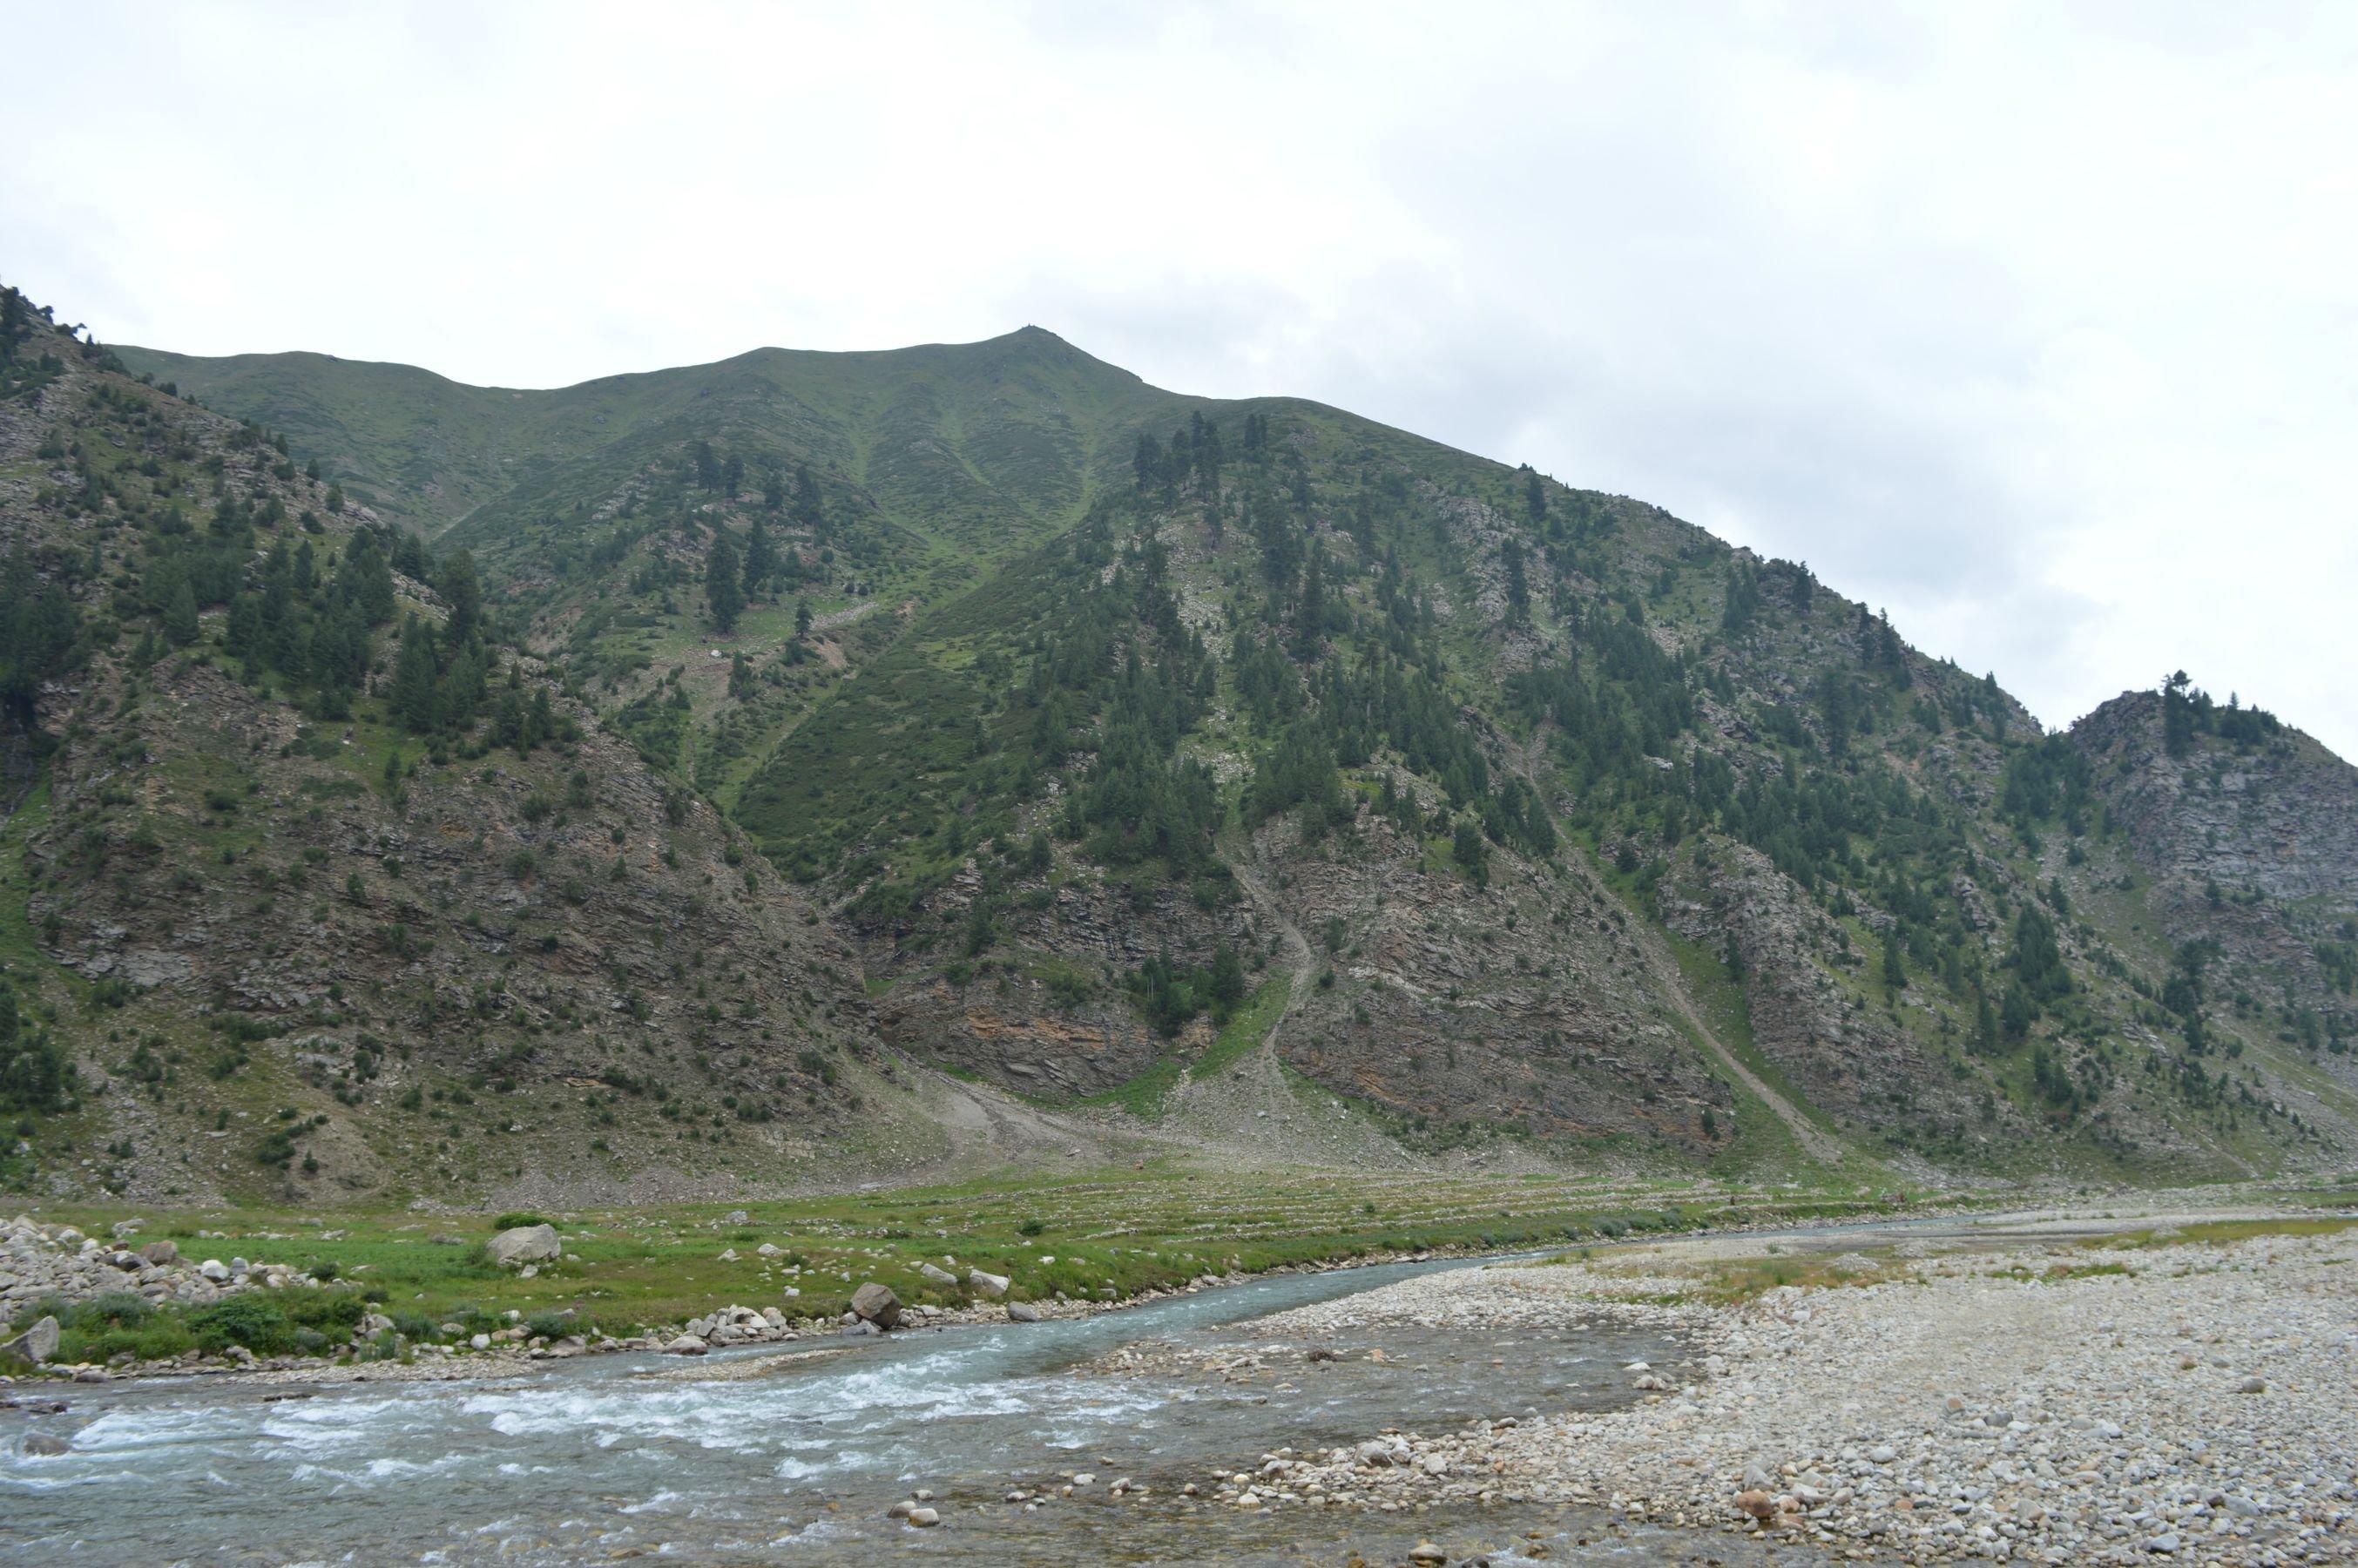 neelum river hd free - photo #34